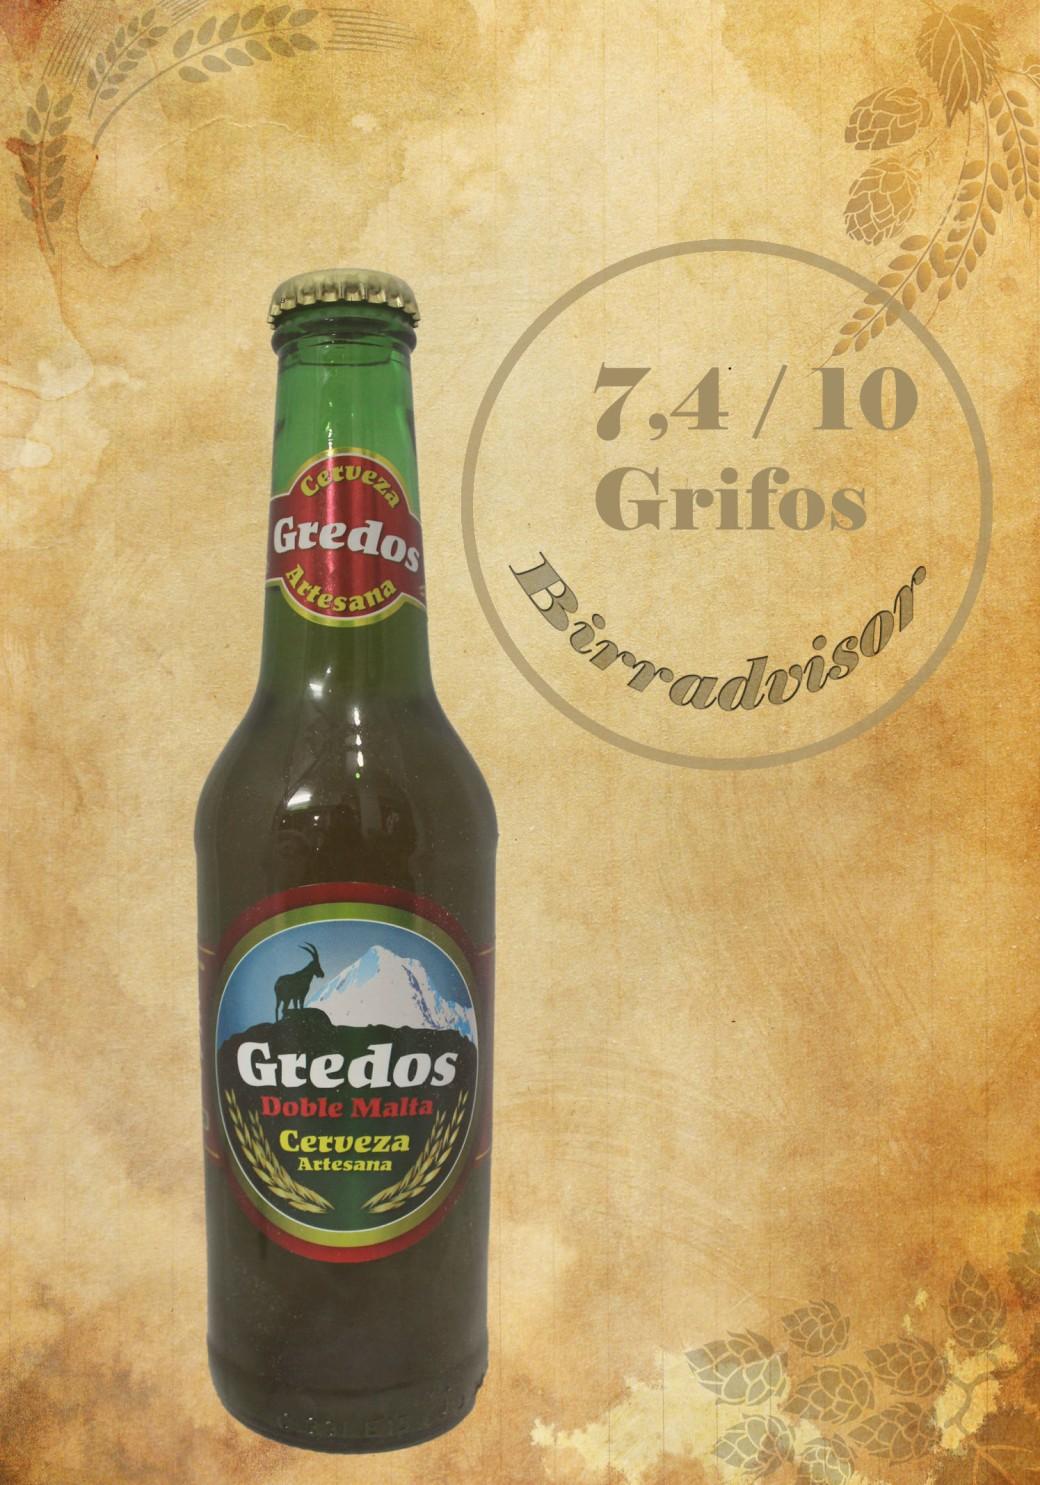 Gredos (doble malta)